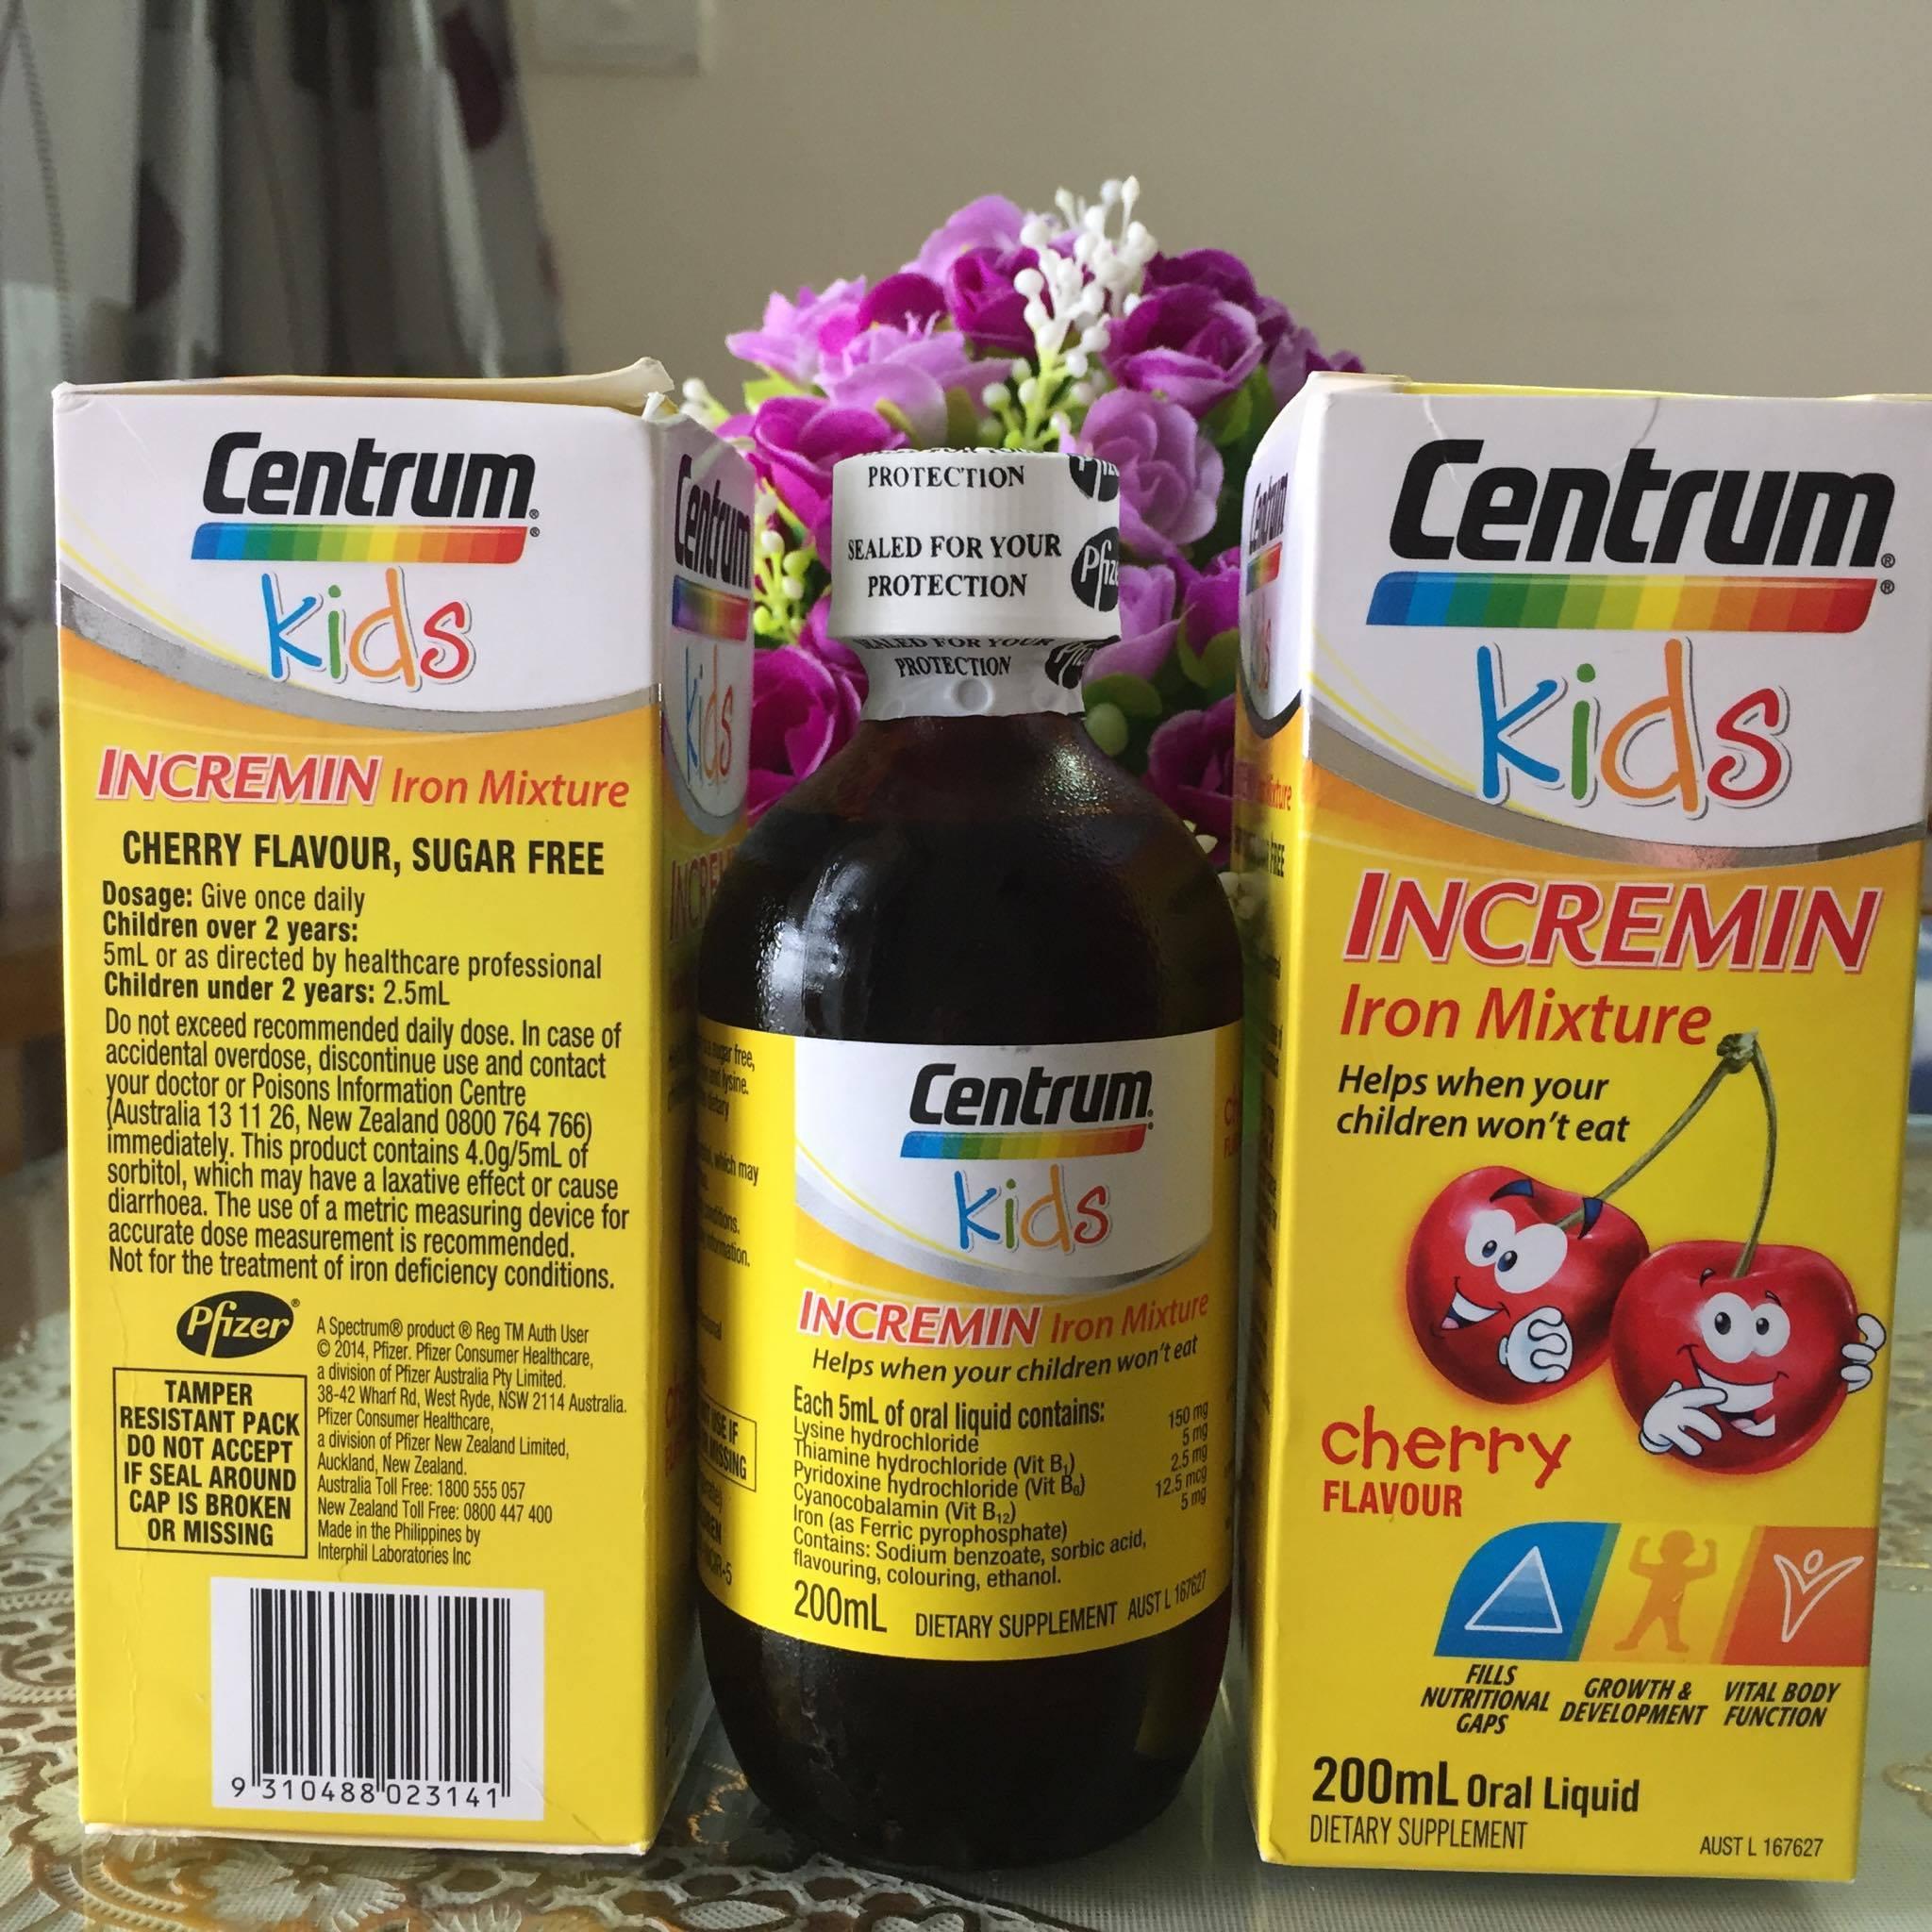 Vitamin cho trẻ biếng ăn - Centrum Kids Incremin Iron Mixture 200ml